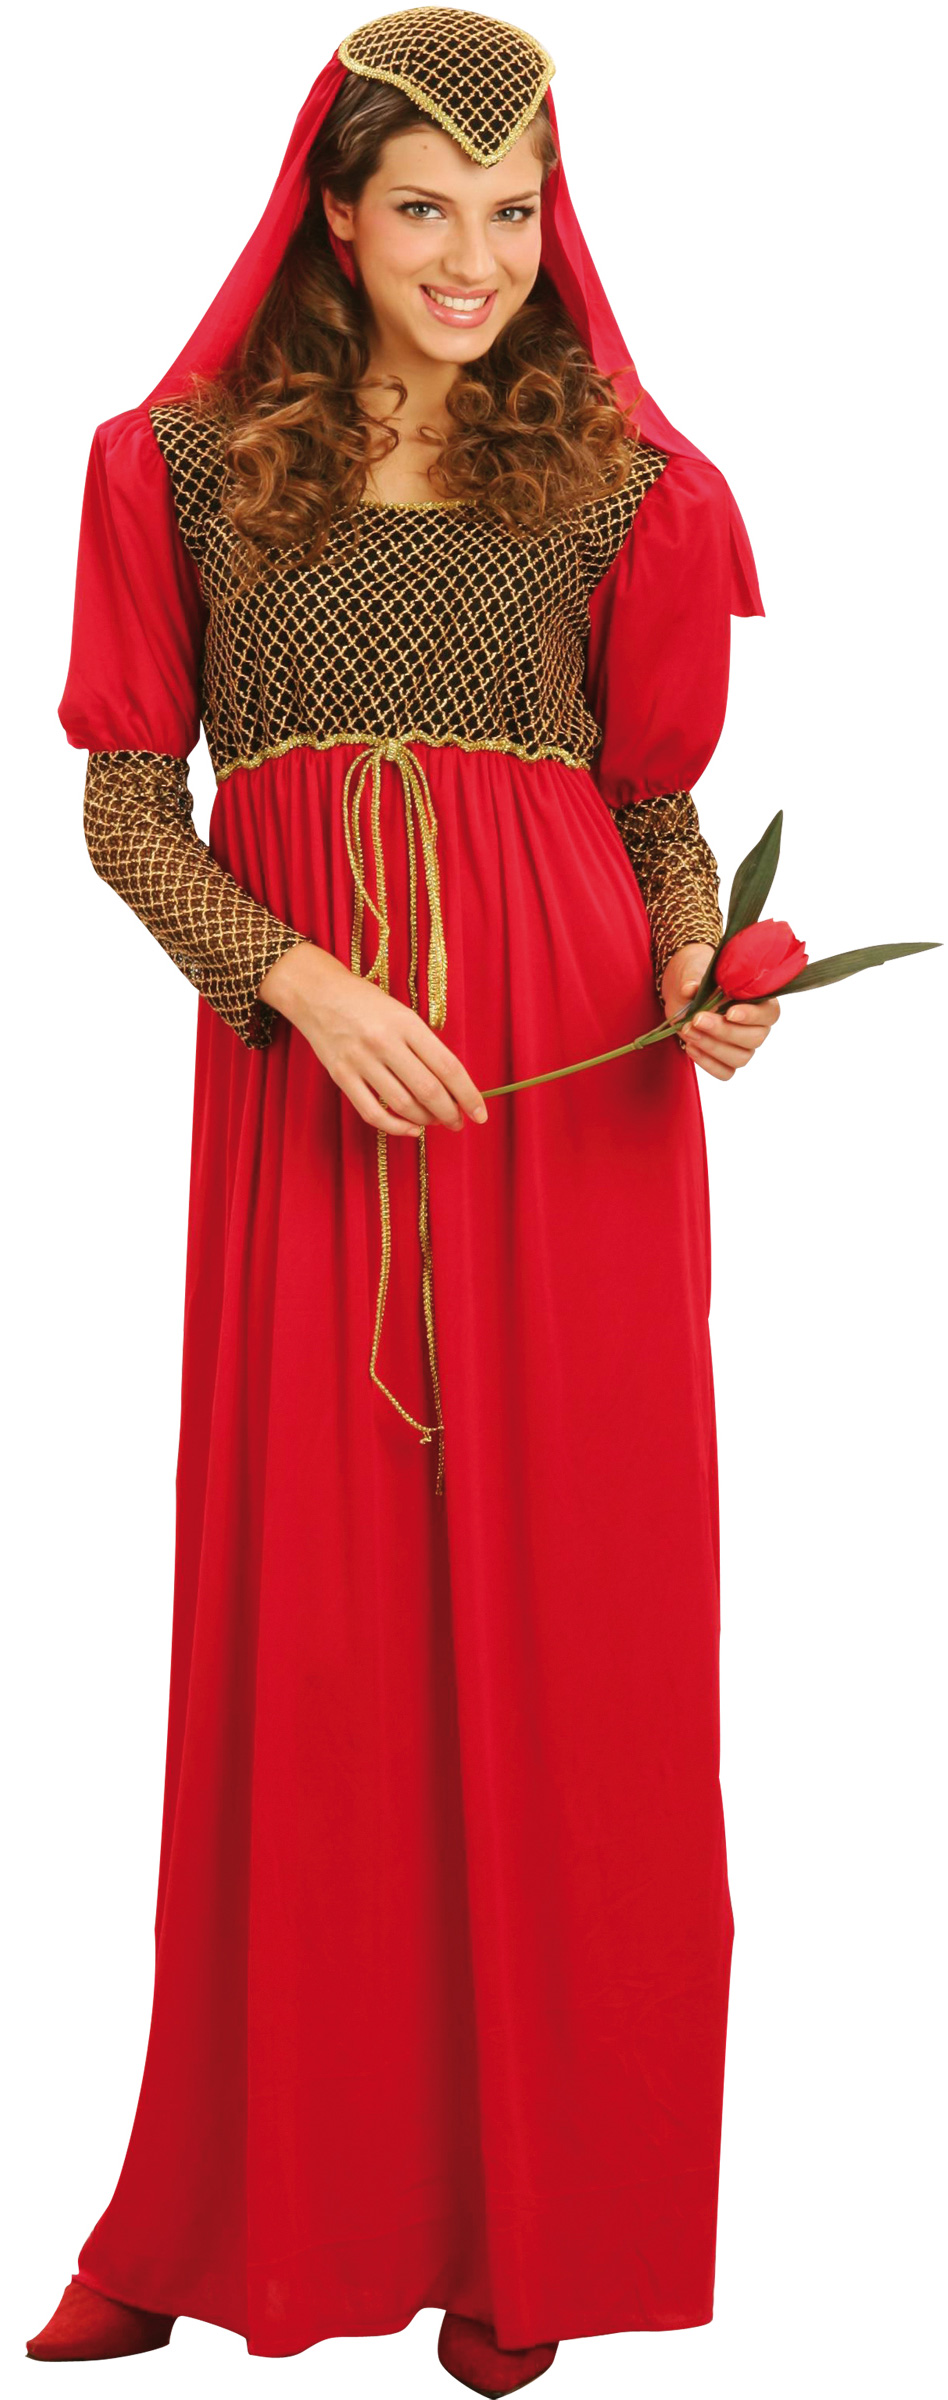 Deguisement-medieval-femme-Cod-167762